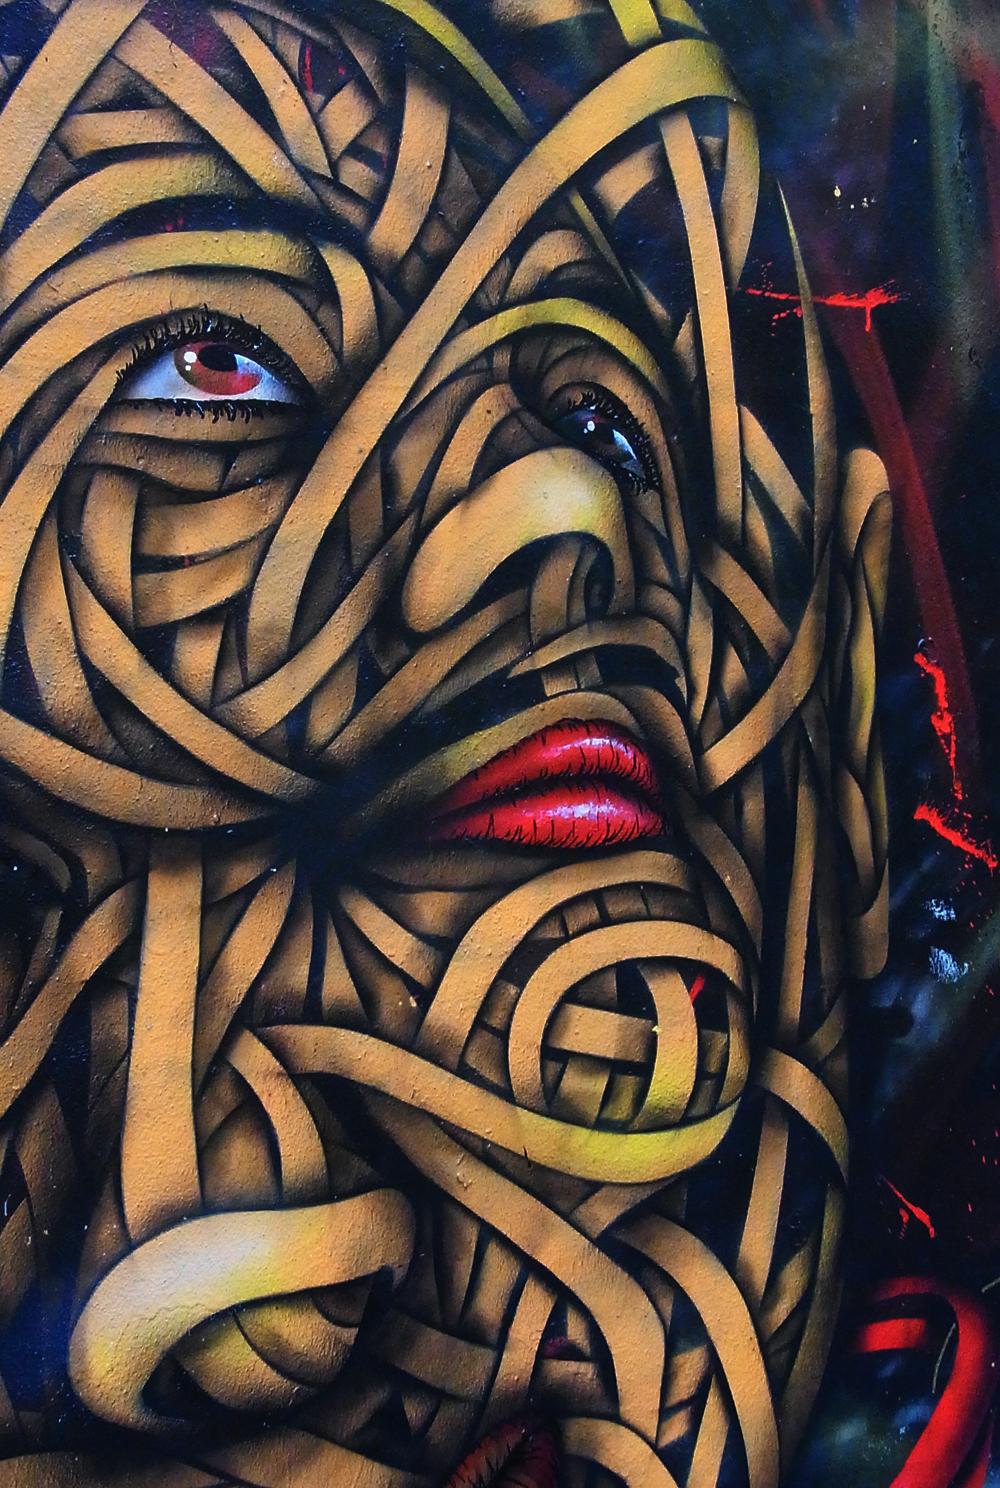 Street Art Berlin - unravelling